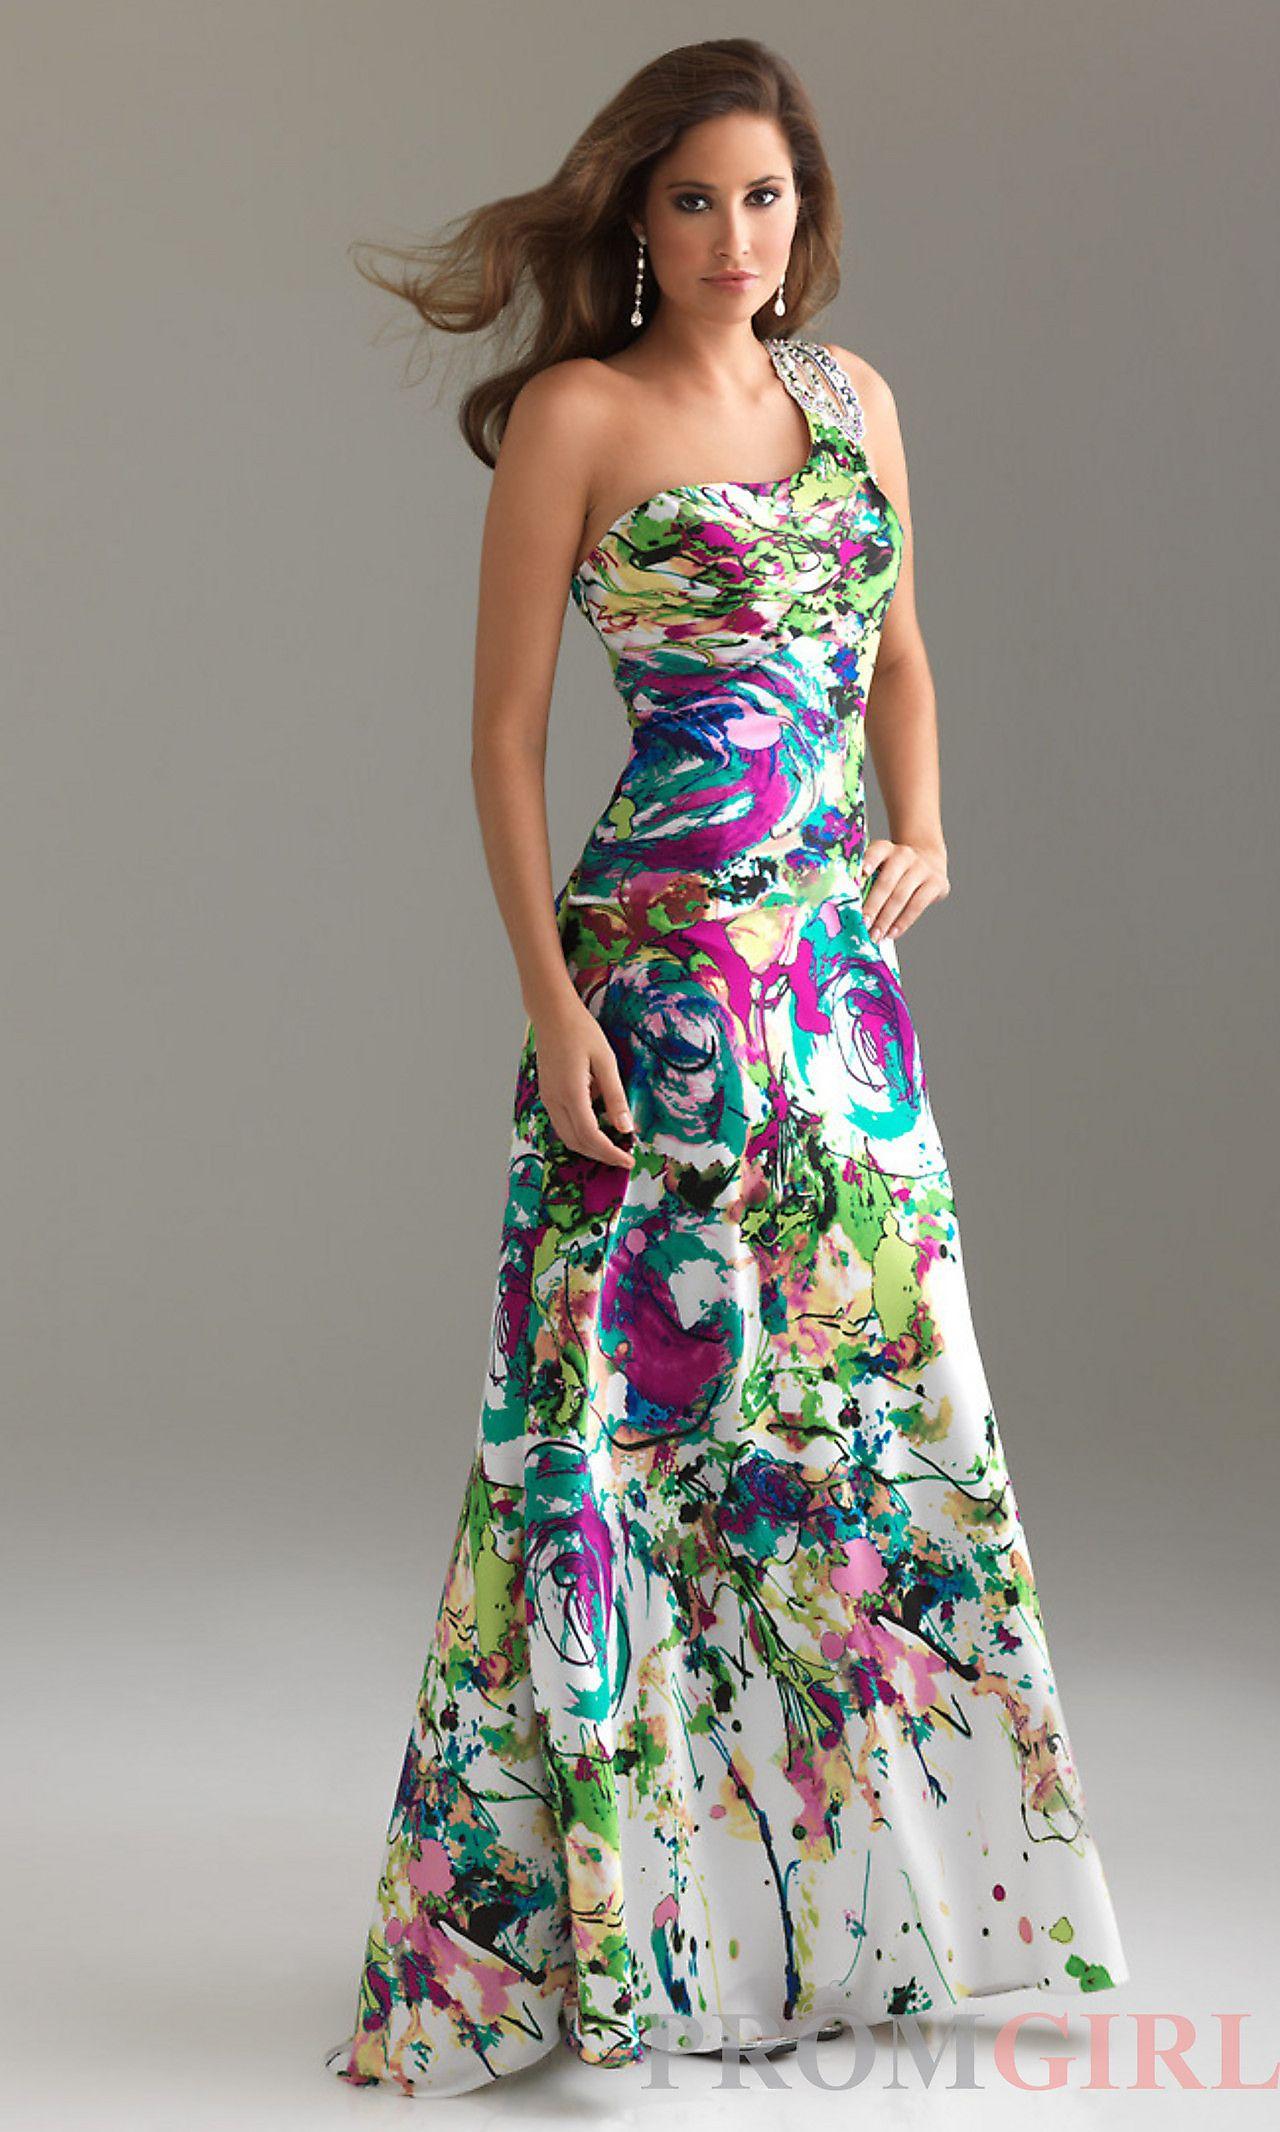 Épinglé par Terri Lynn sur BridesMaids Robe habillée